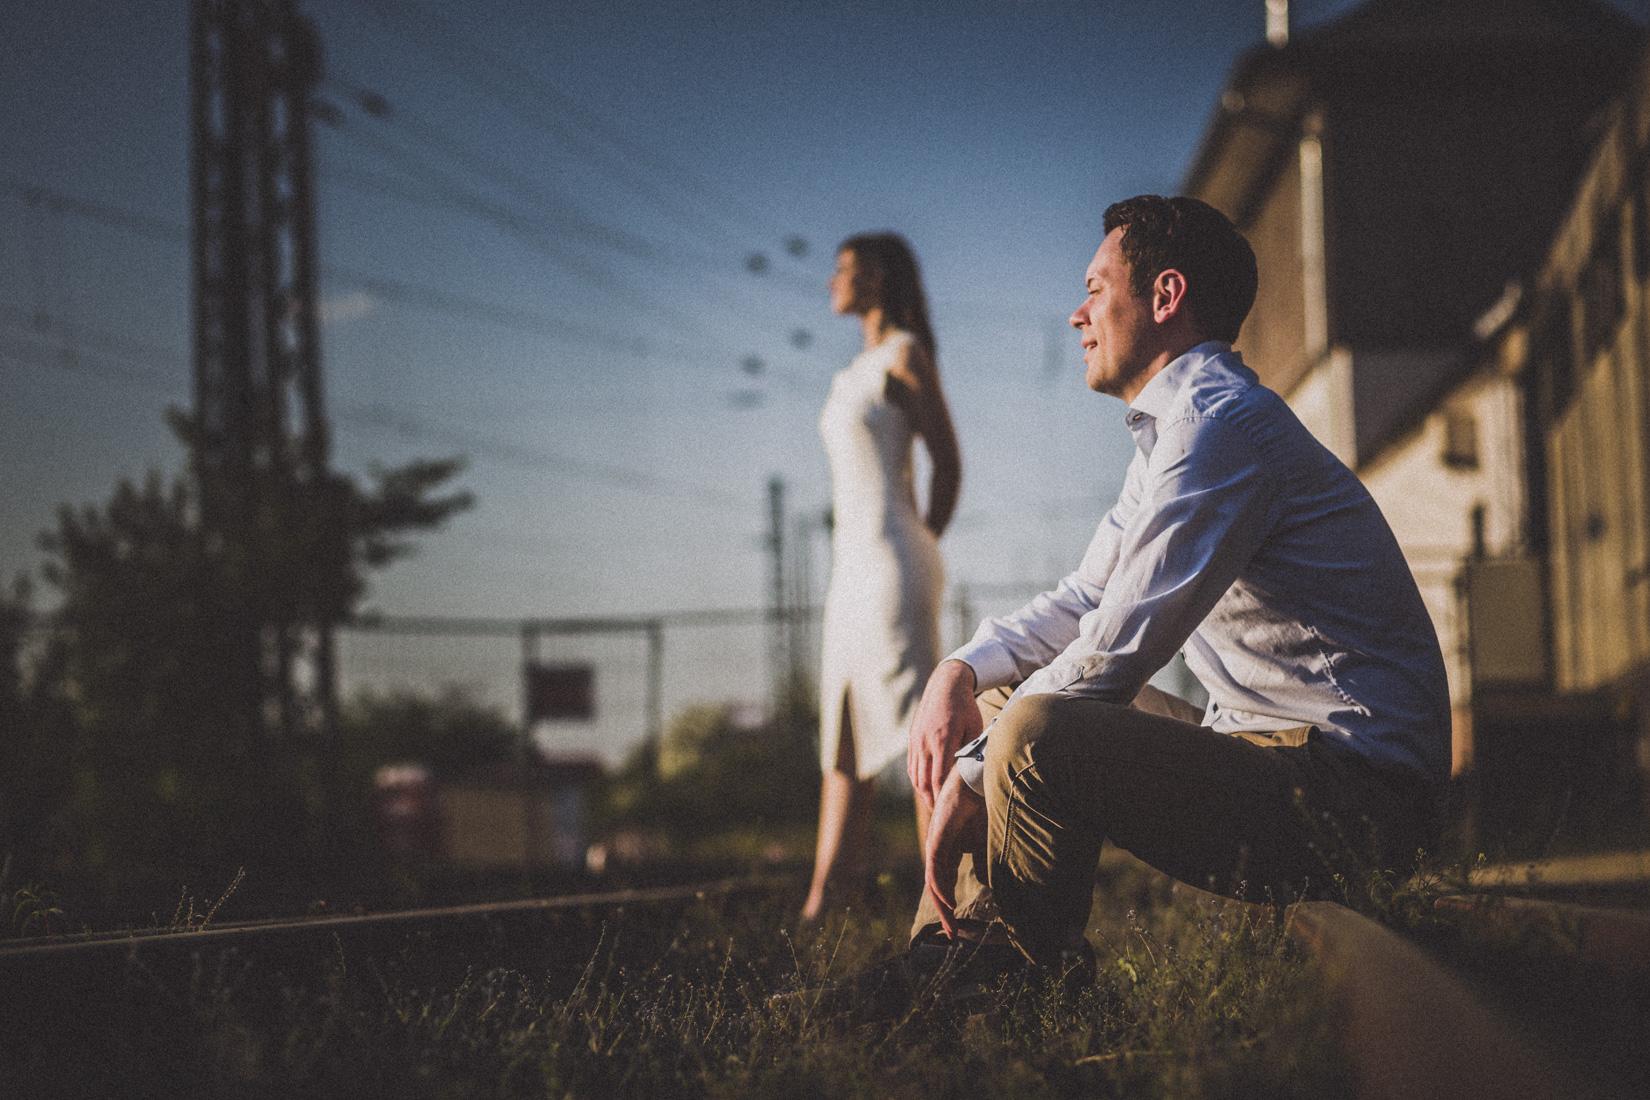 7. Mai 2016 * Verlobungsshooting * Paarshooting * Janine & Soeren * Hochzeitsfotograf Frankfurt